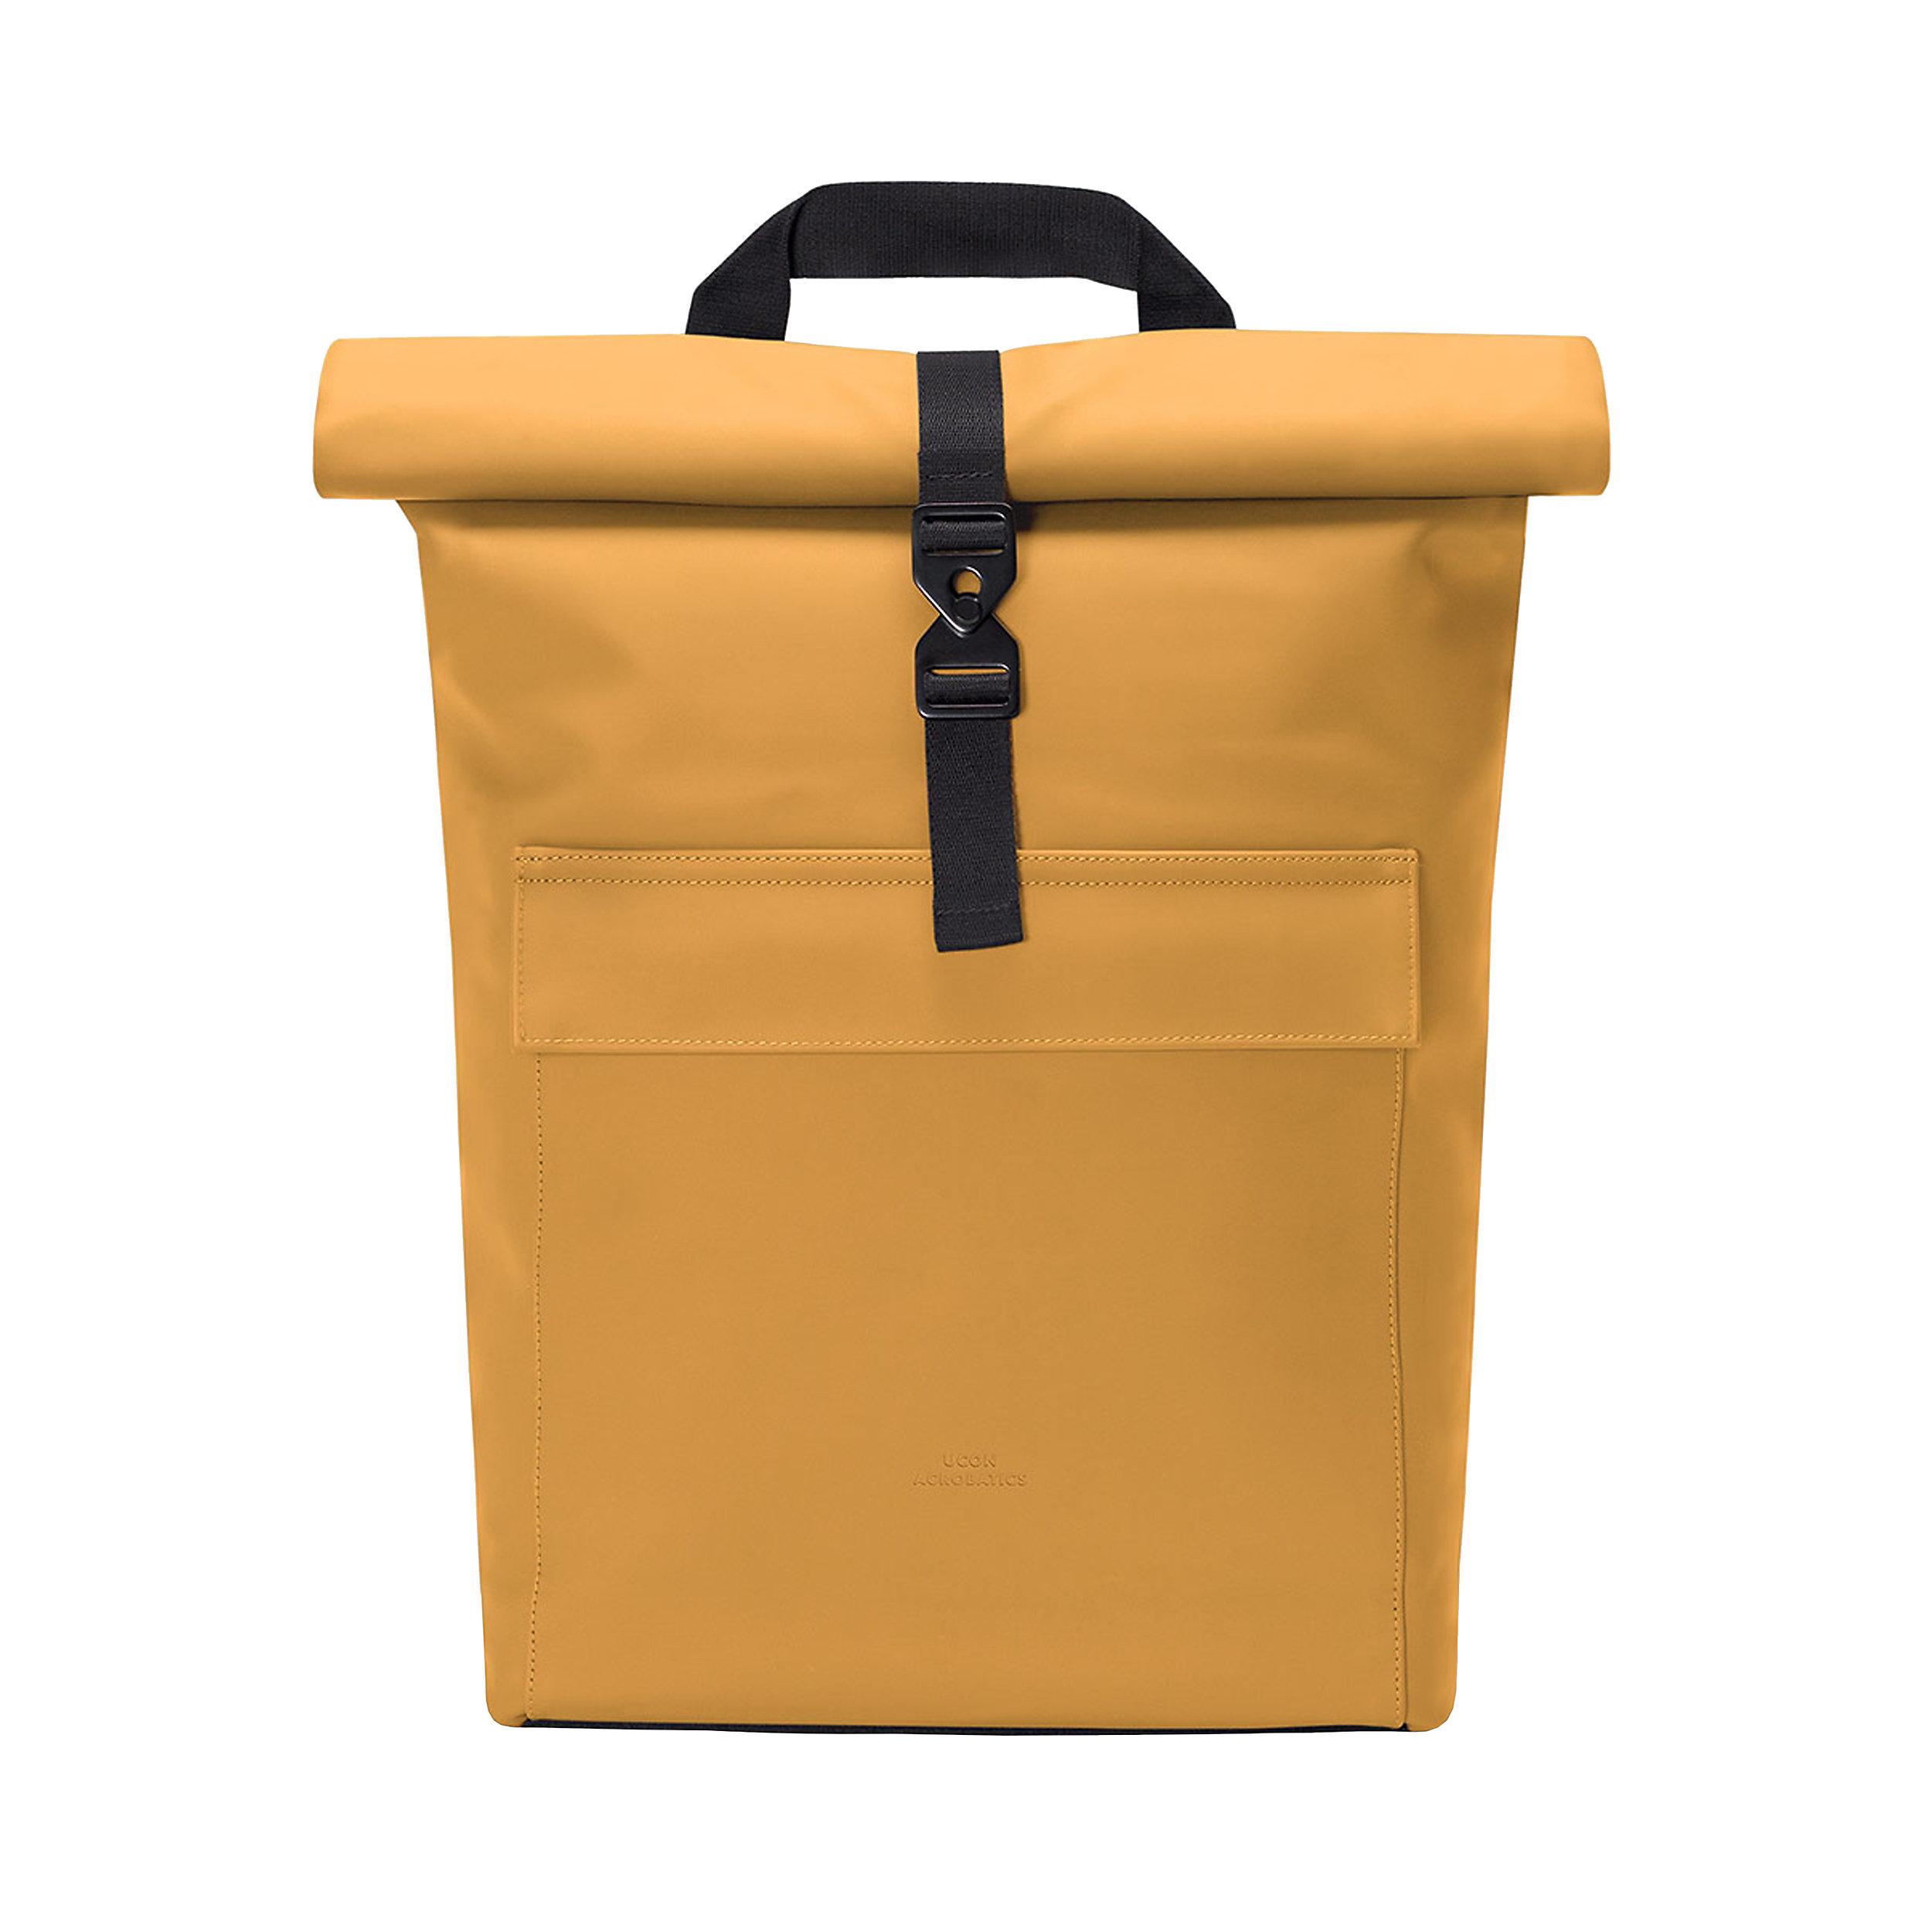 "Rucksack Jasper 16"" Lotus Series 20 Liter - Honey Mustard"